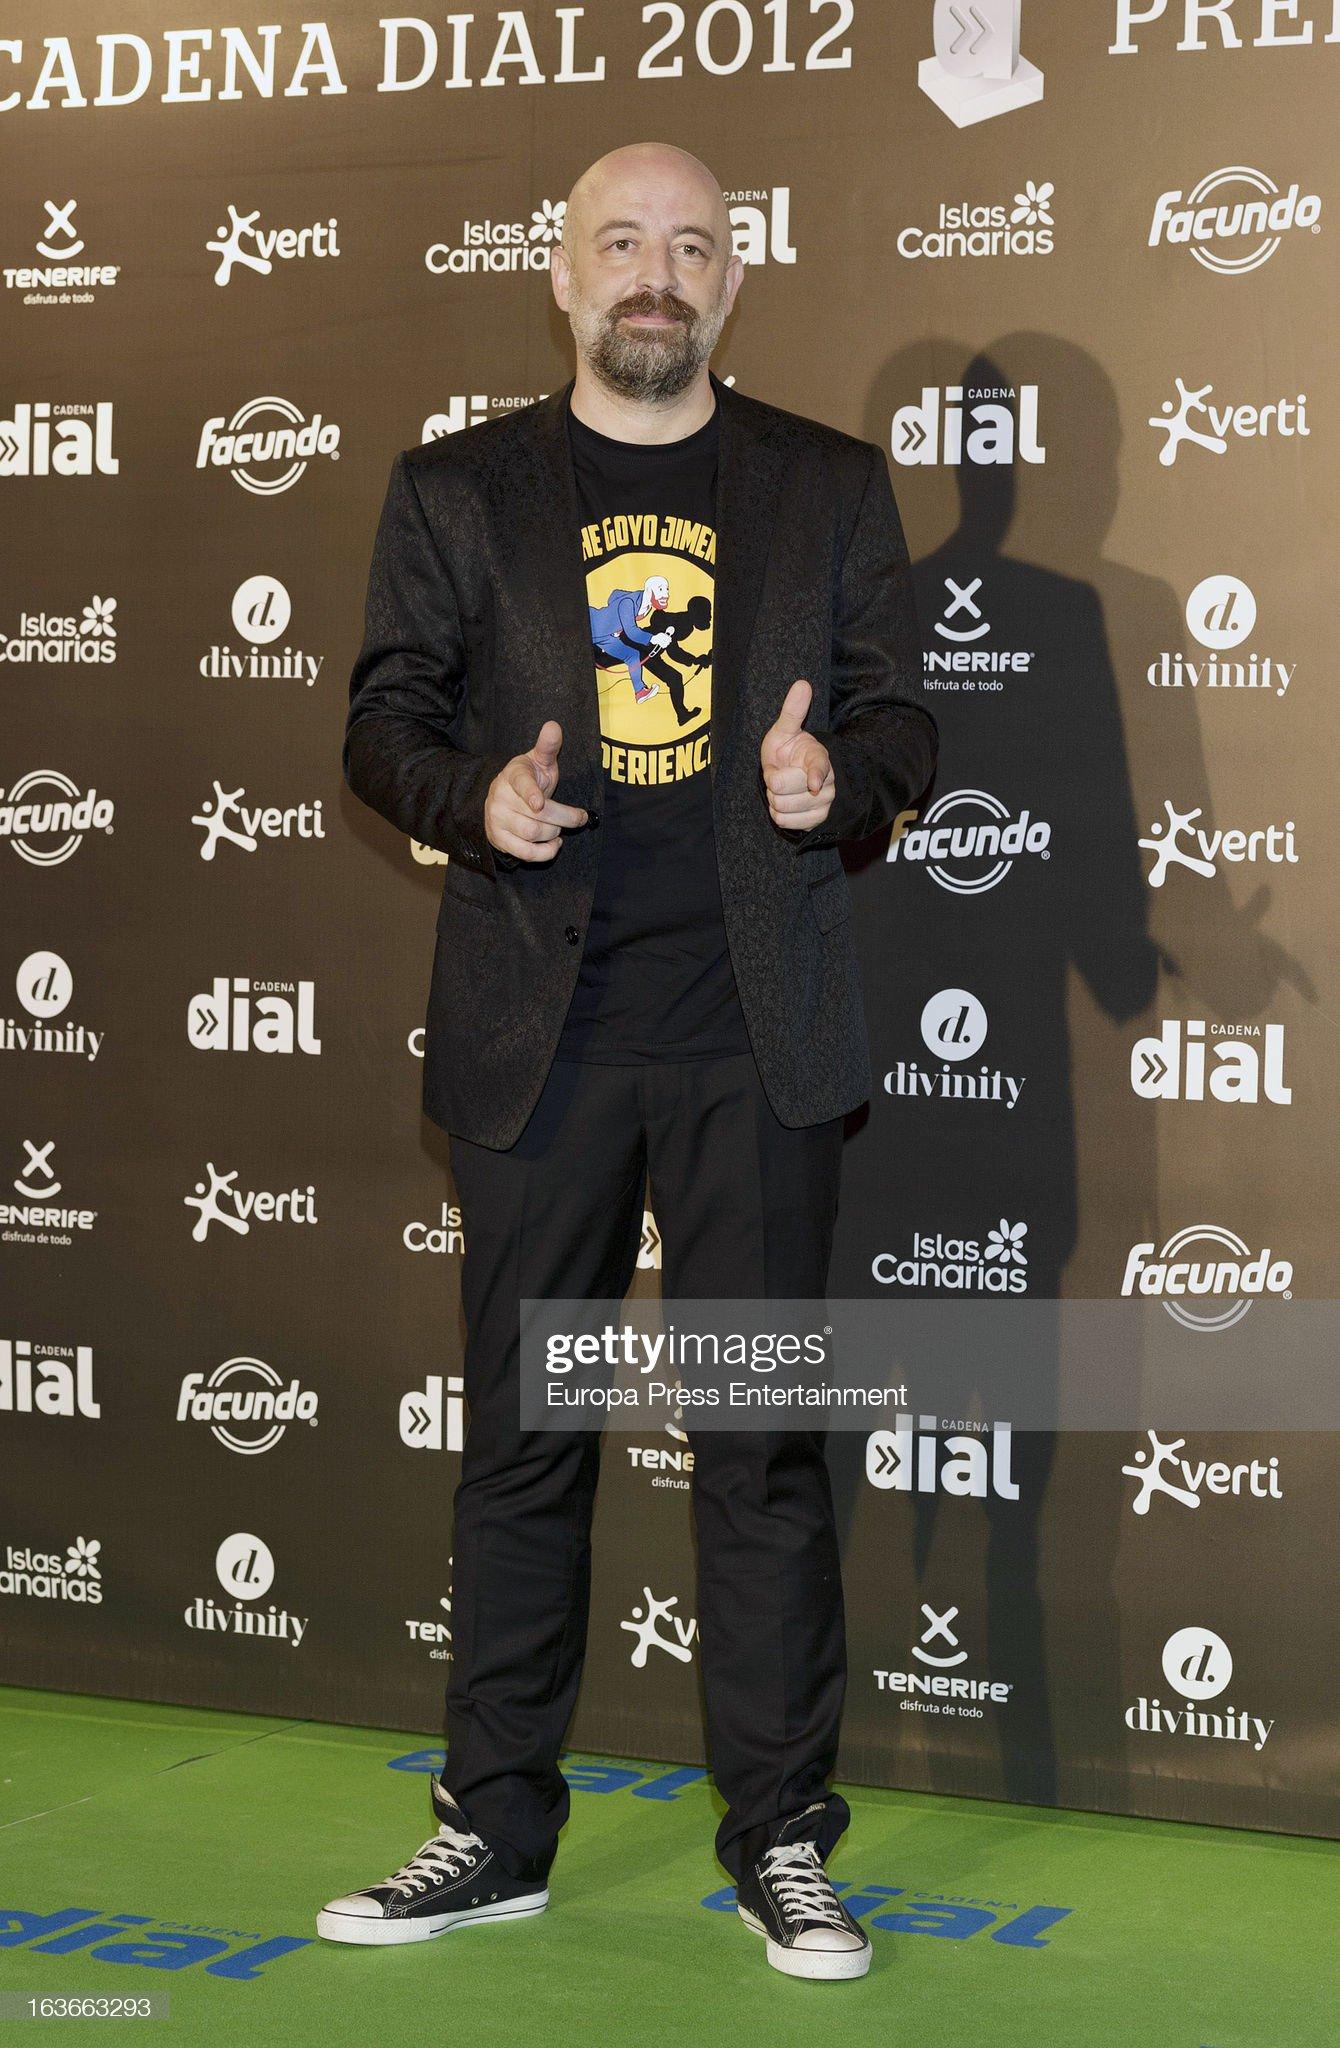 ¿Cuánto mide Goyo Jiménez? - Altura Goyo-jimenez-attends-cadena-dial-award-during-the-cadena-dial-awards-picture-id163663293?s=2048x2048